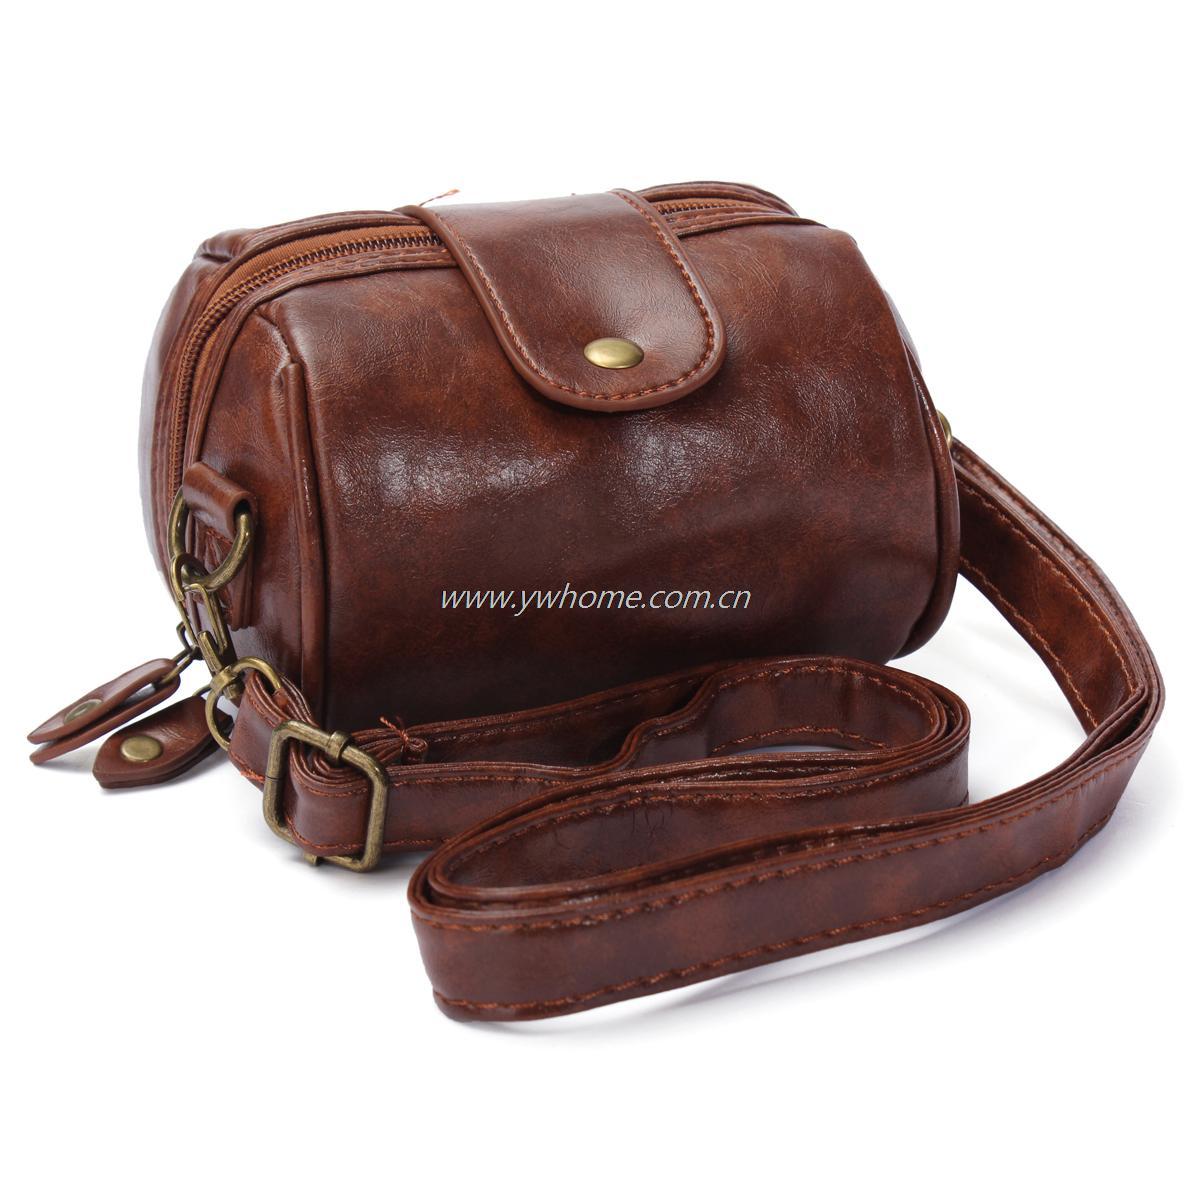 Innovative Buy Brown PU Leather Camera Bag For DSLR | BazaarGadgets.com